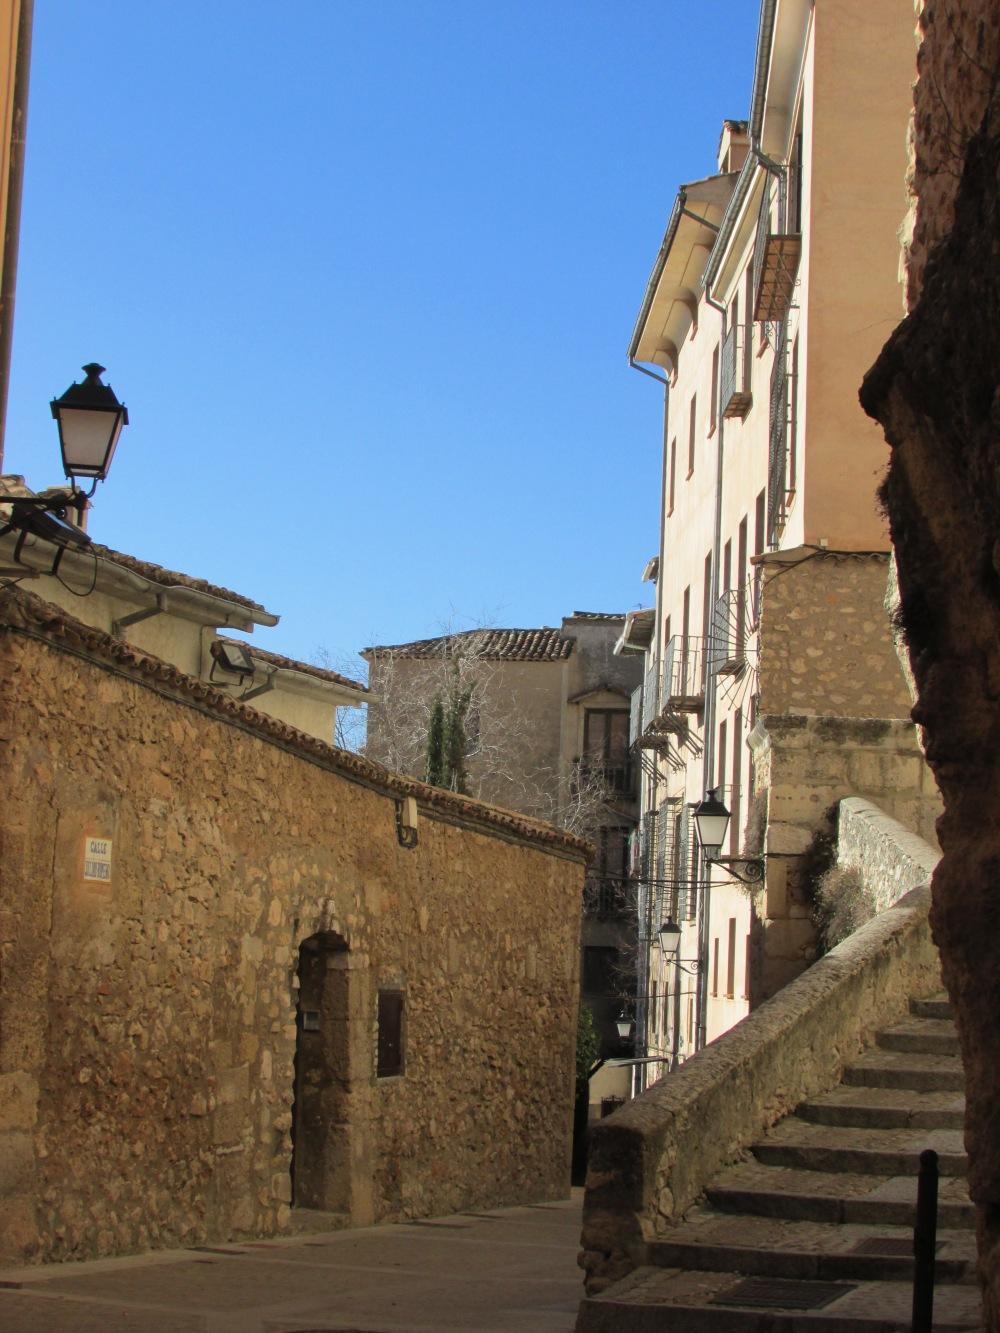 Cuenca's medieval heart